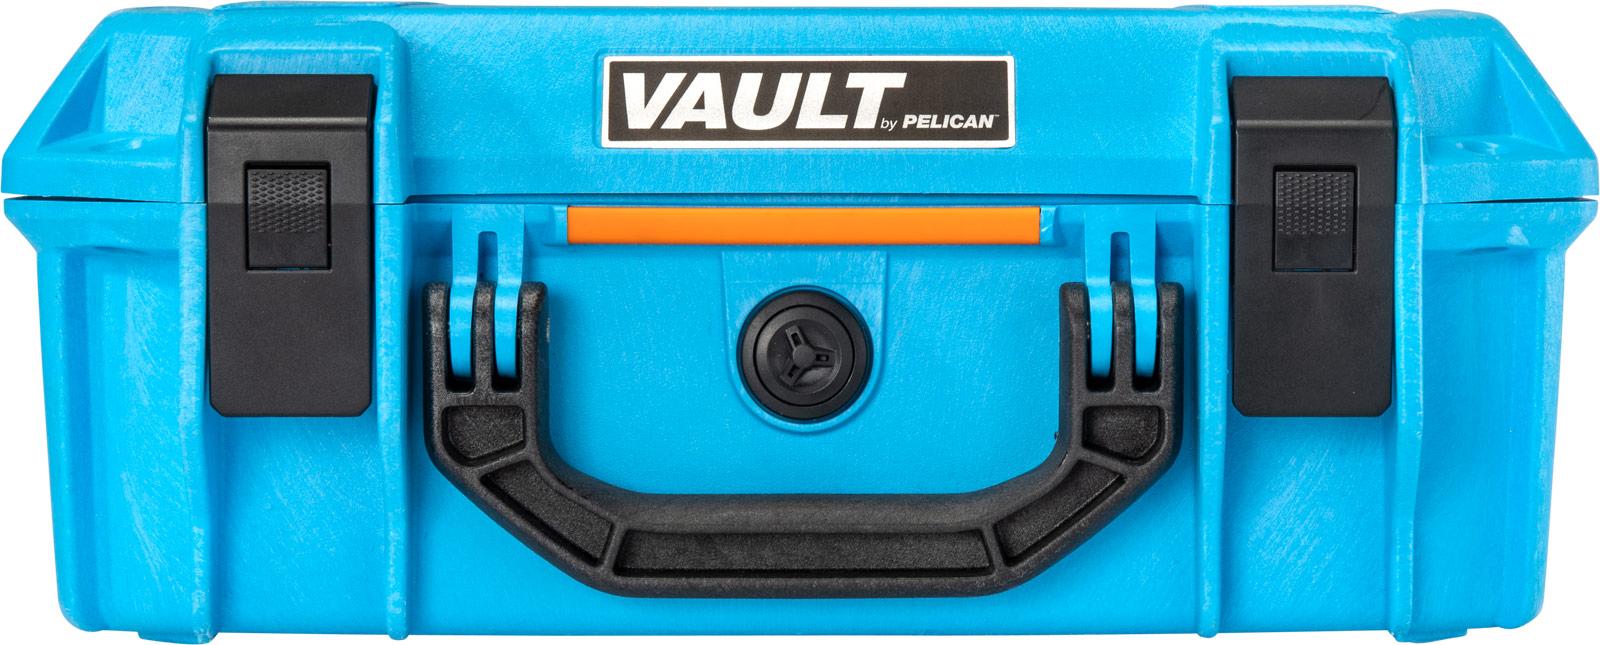 pelican blue vault color cases v200c case